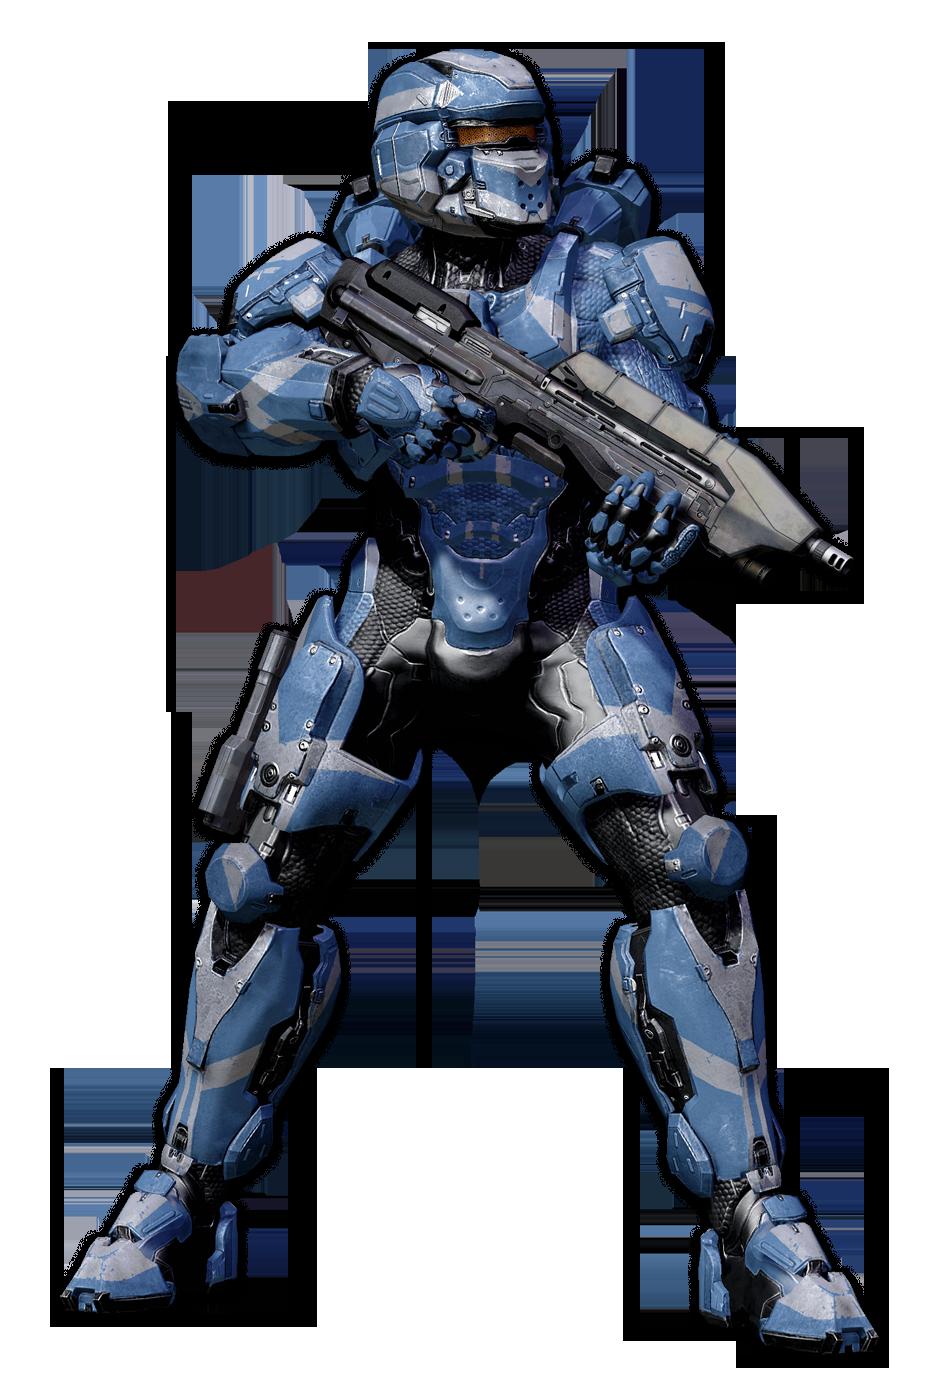 Reclaimer Halo Halo Tattoo Gaming Tattoo Halo